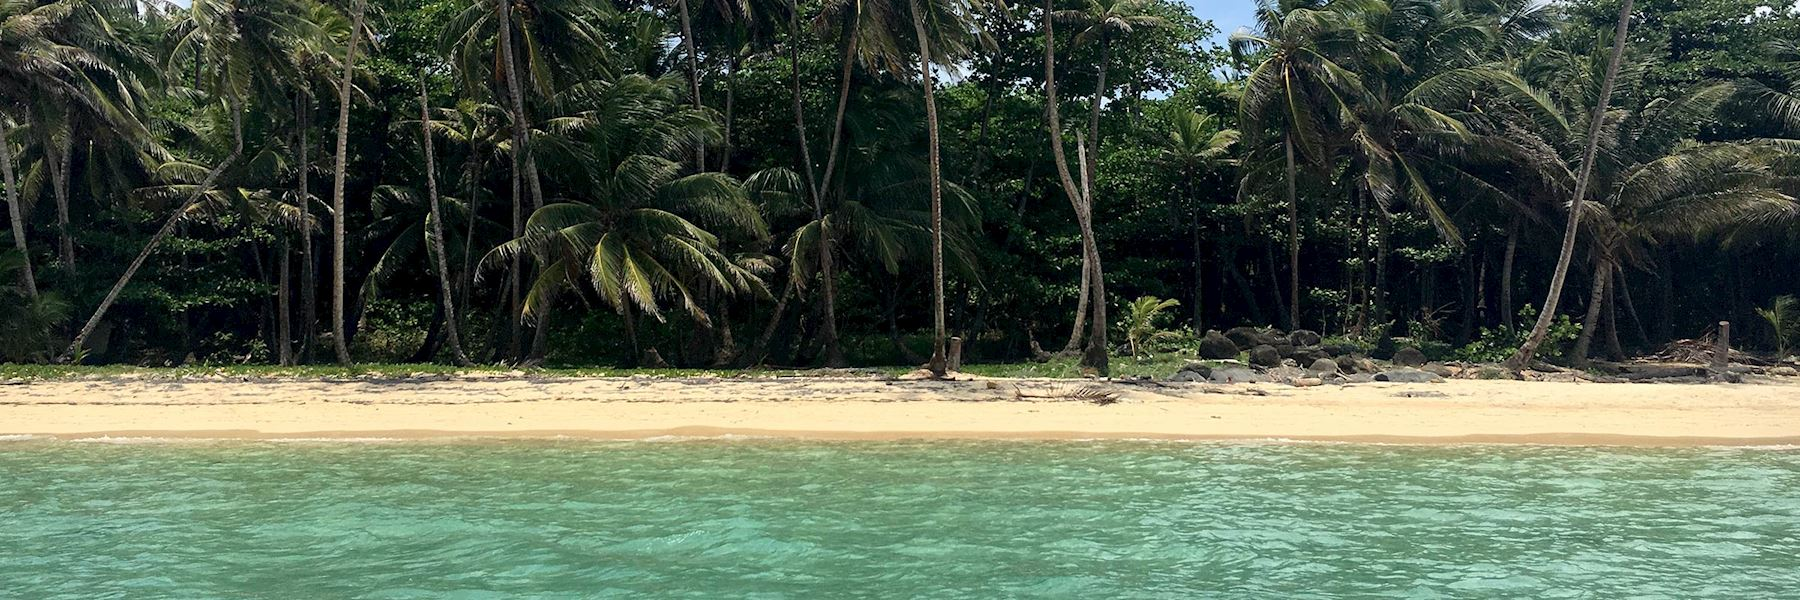 Visit the Corn Islands, Nicaragua